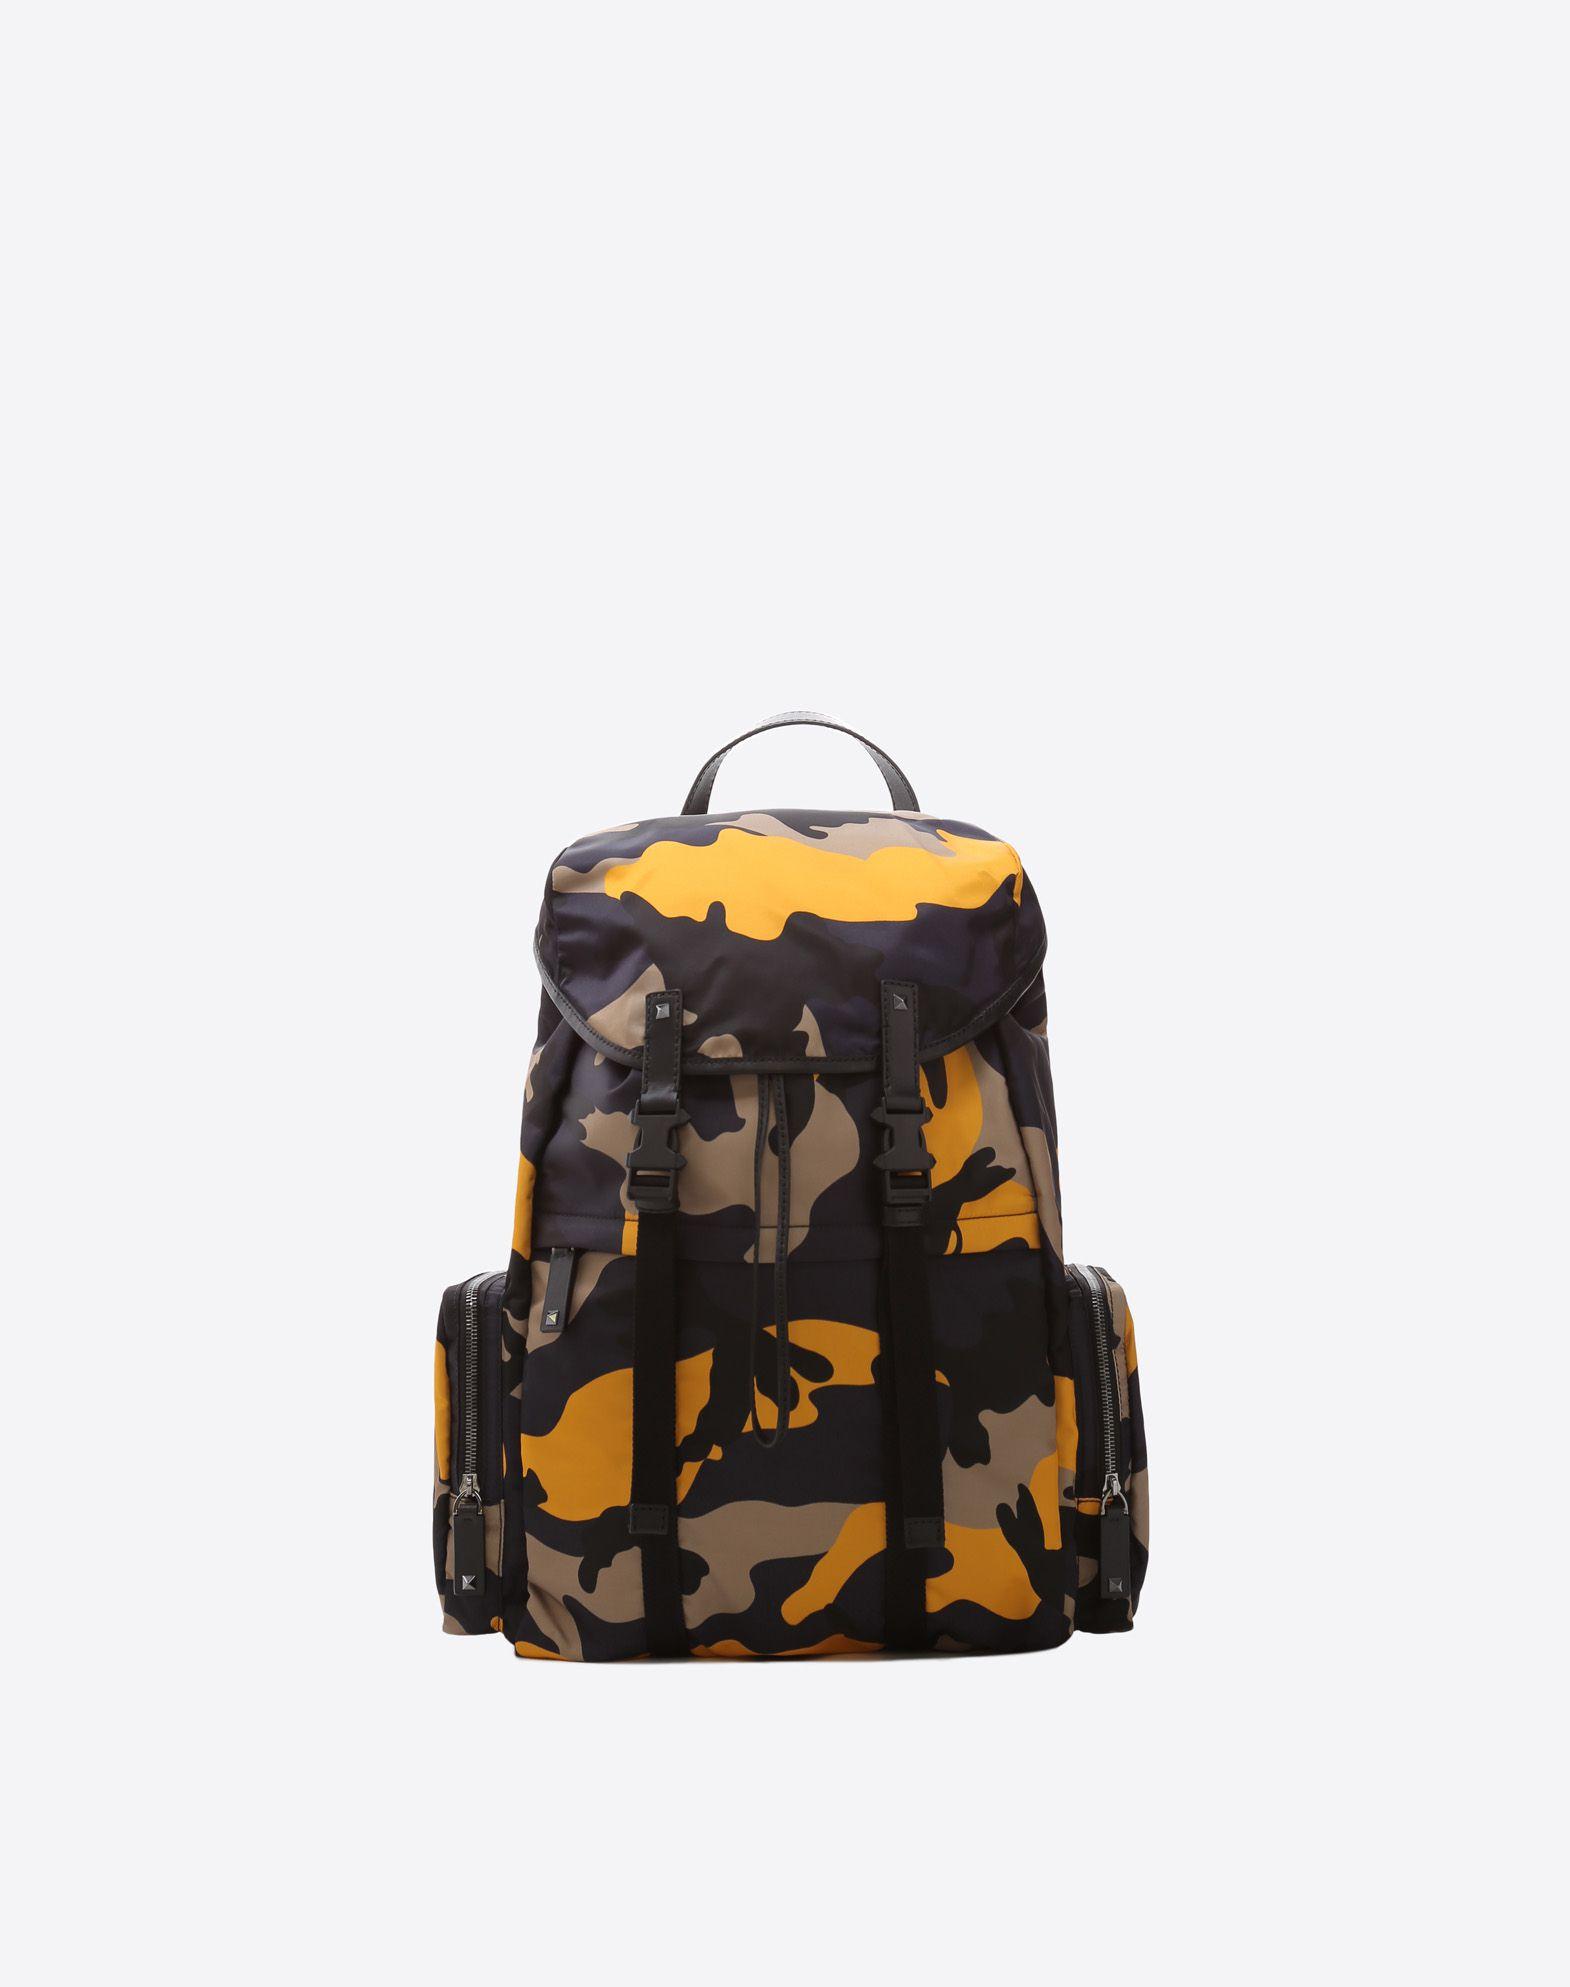 VALENTINO GARAVANI UOMO Camouflage Large Backpack Backpack U f